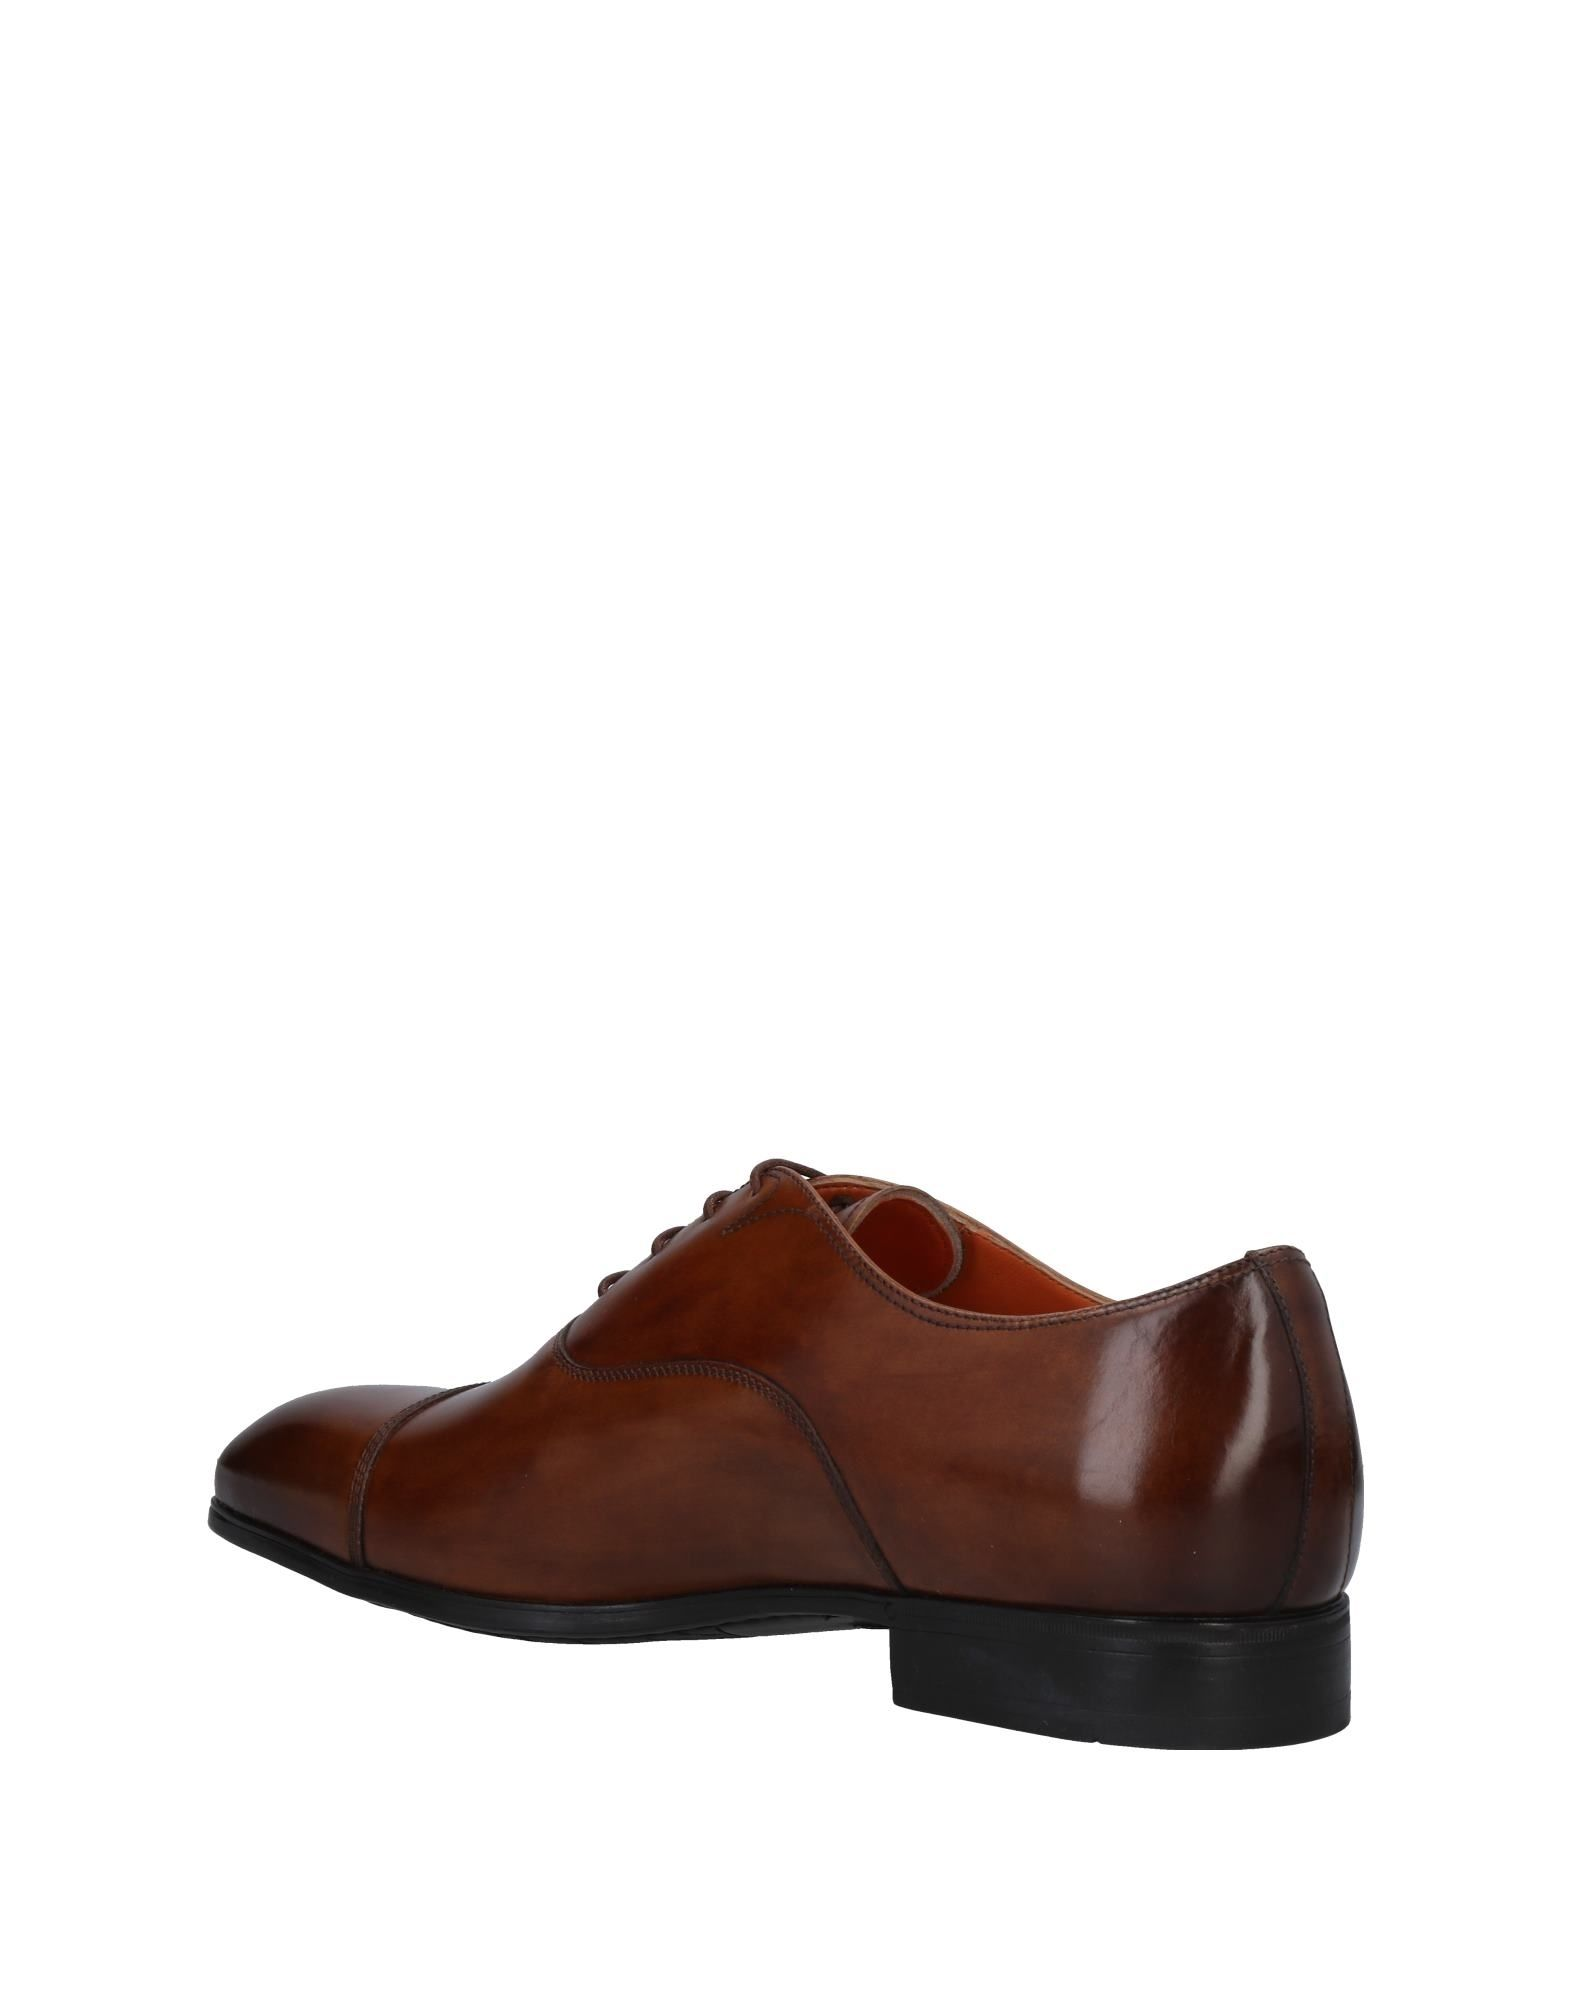 Santoni Schnürschuhe Herren  beliebte 11479219KT Gute Qualität beliebte  Schuhe ee05d0